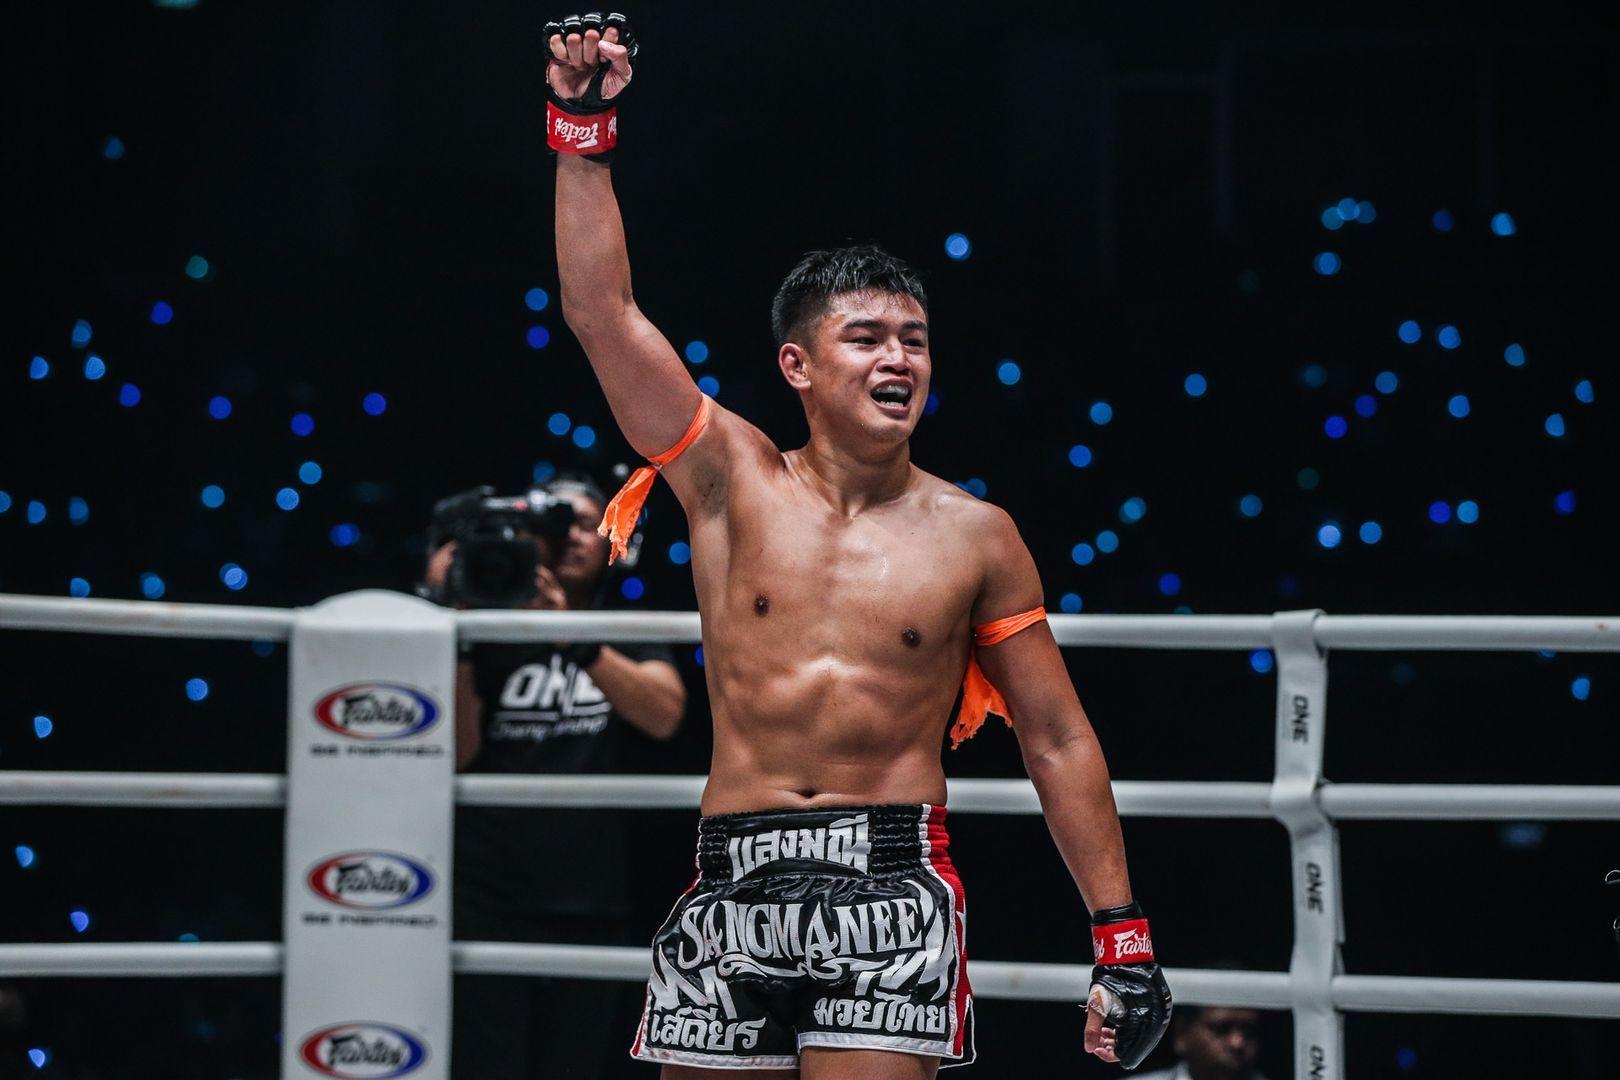 Sangmanee Sathian MuayThai defeats Kenta Yamada at ONE A NEW TOMORROW